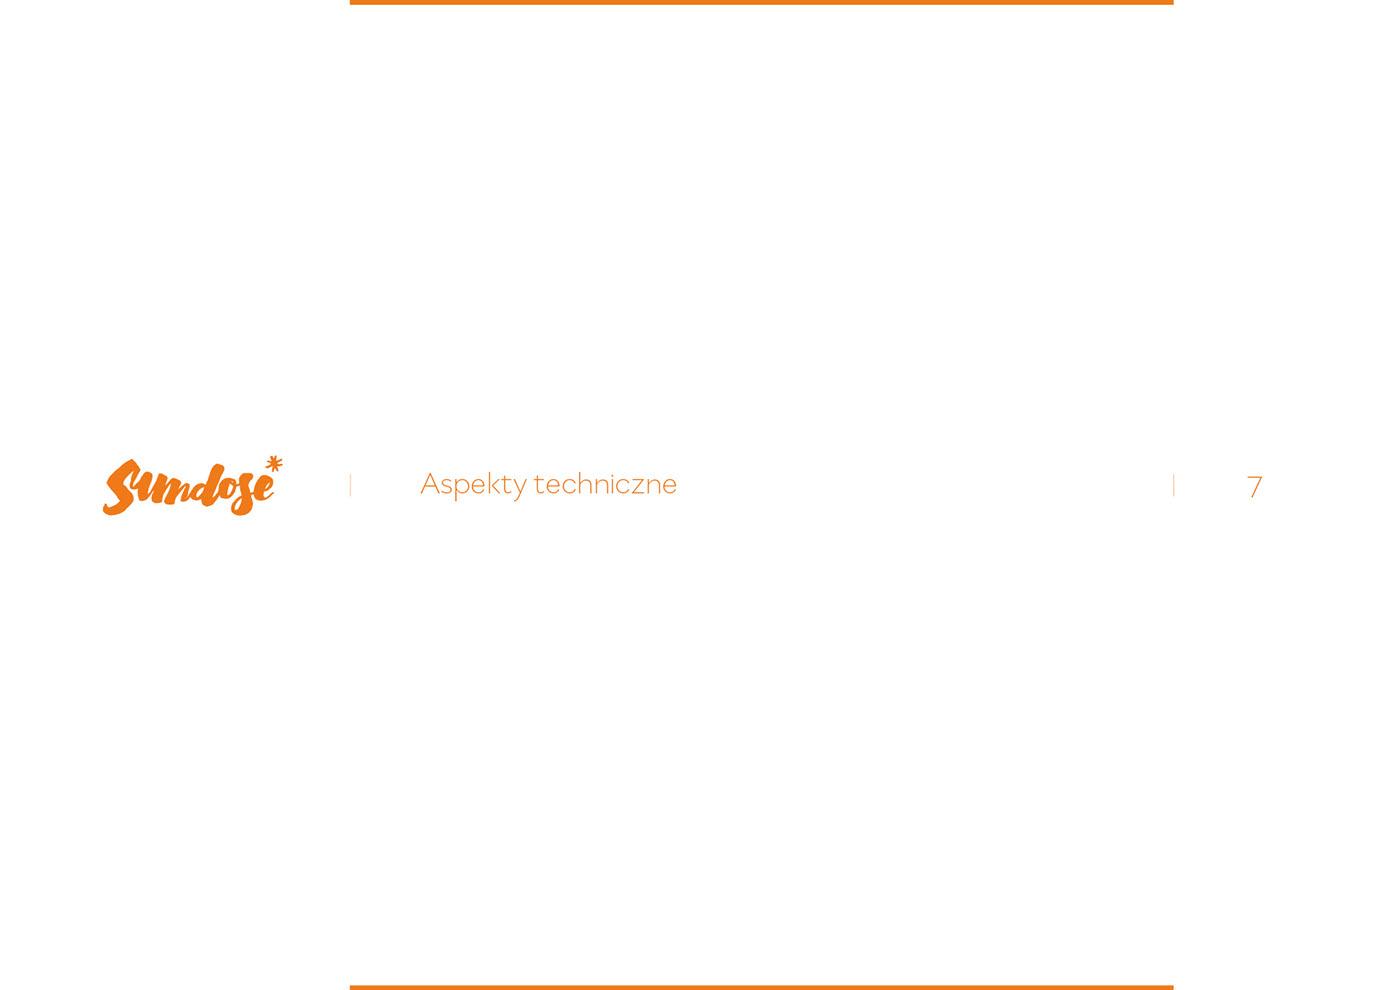 sundose MACHALSKI Calligraphy   Mateusz Machalski  borutta type design orange